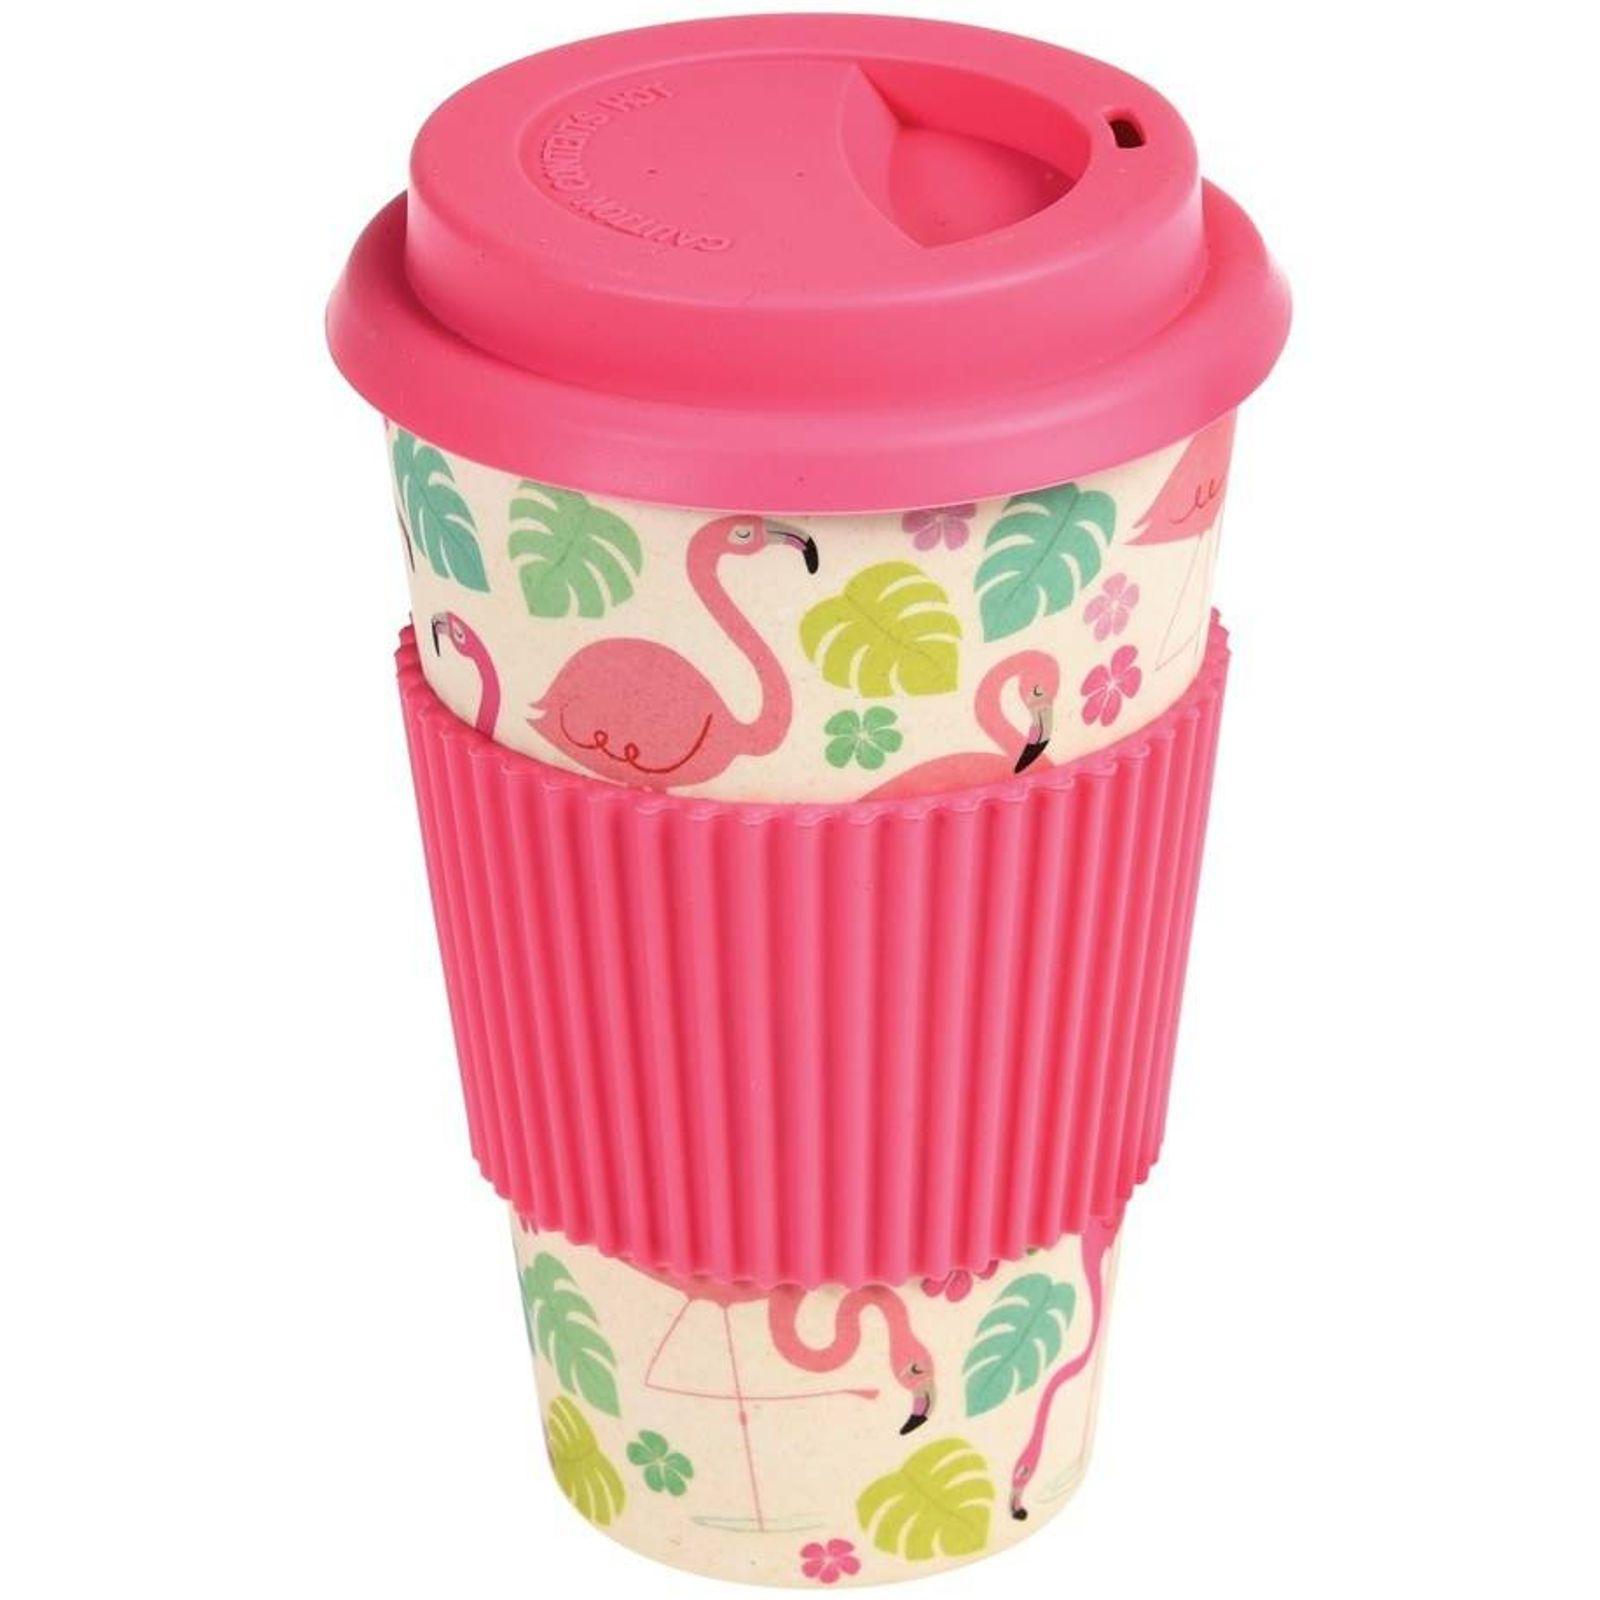 Kaffeebecher Bambus Flamingo Coffee To Go Pink Flamingos Von Rex